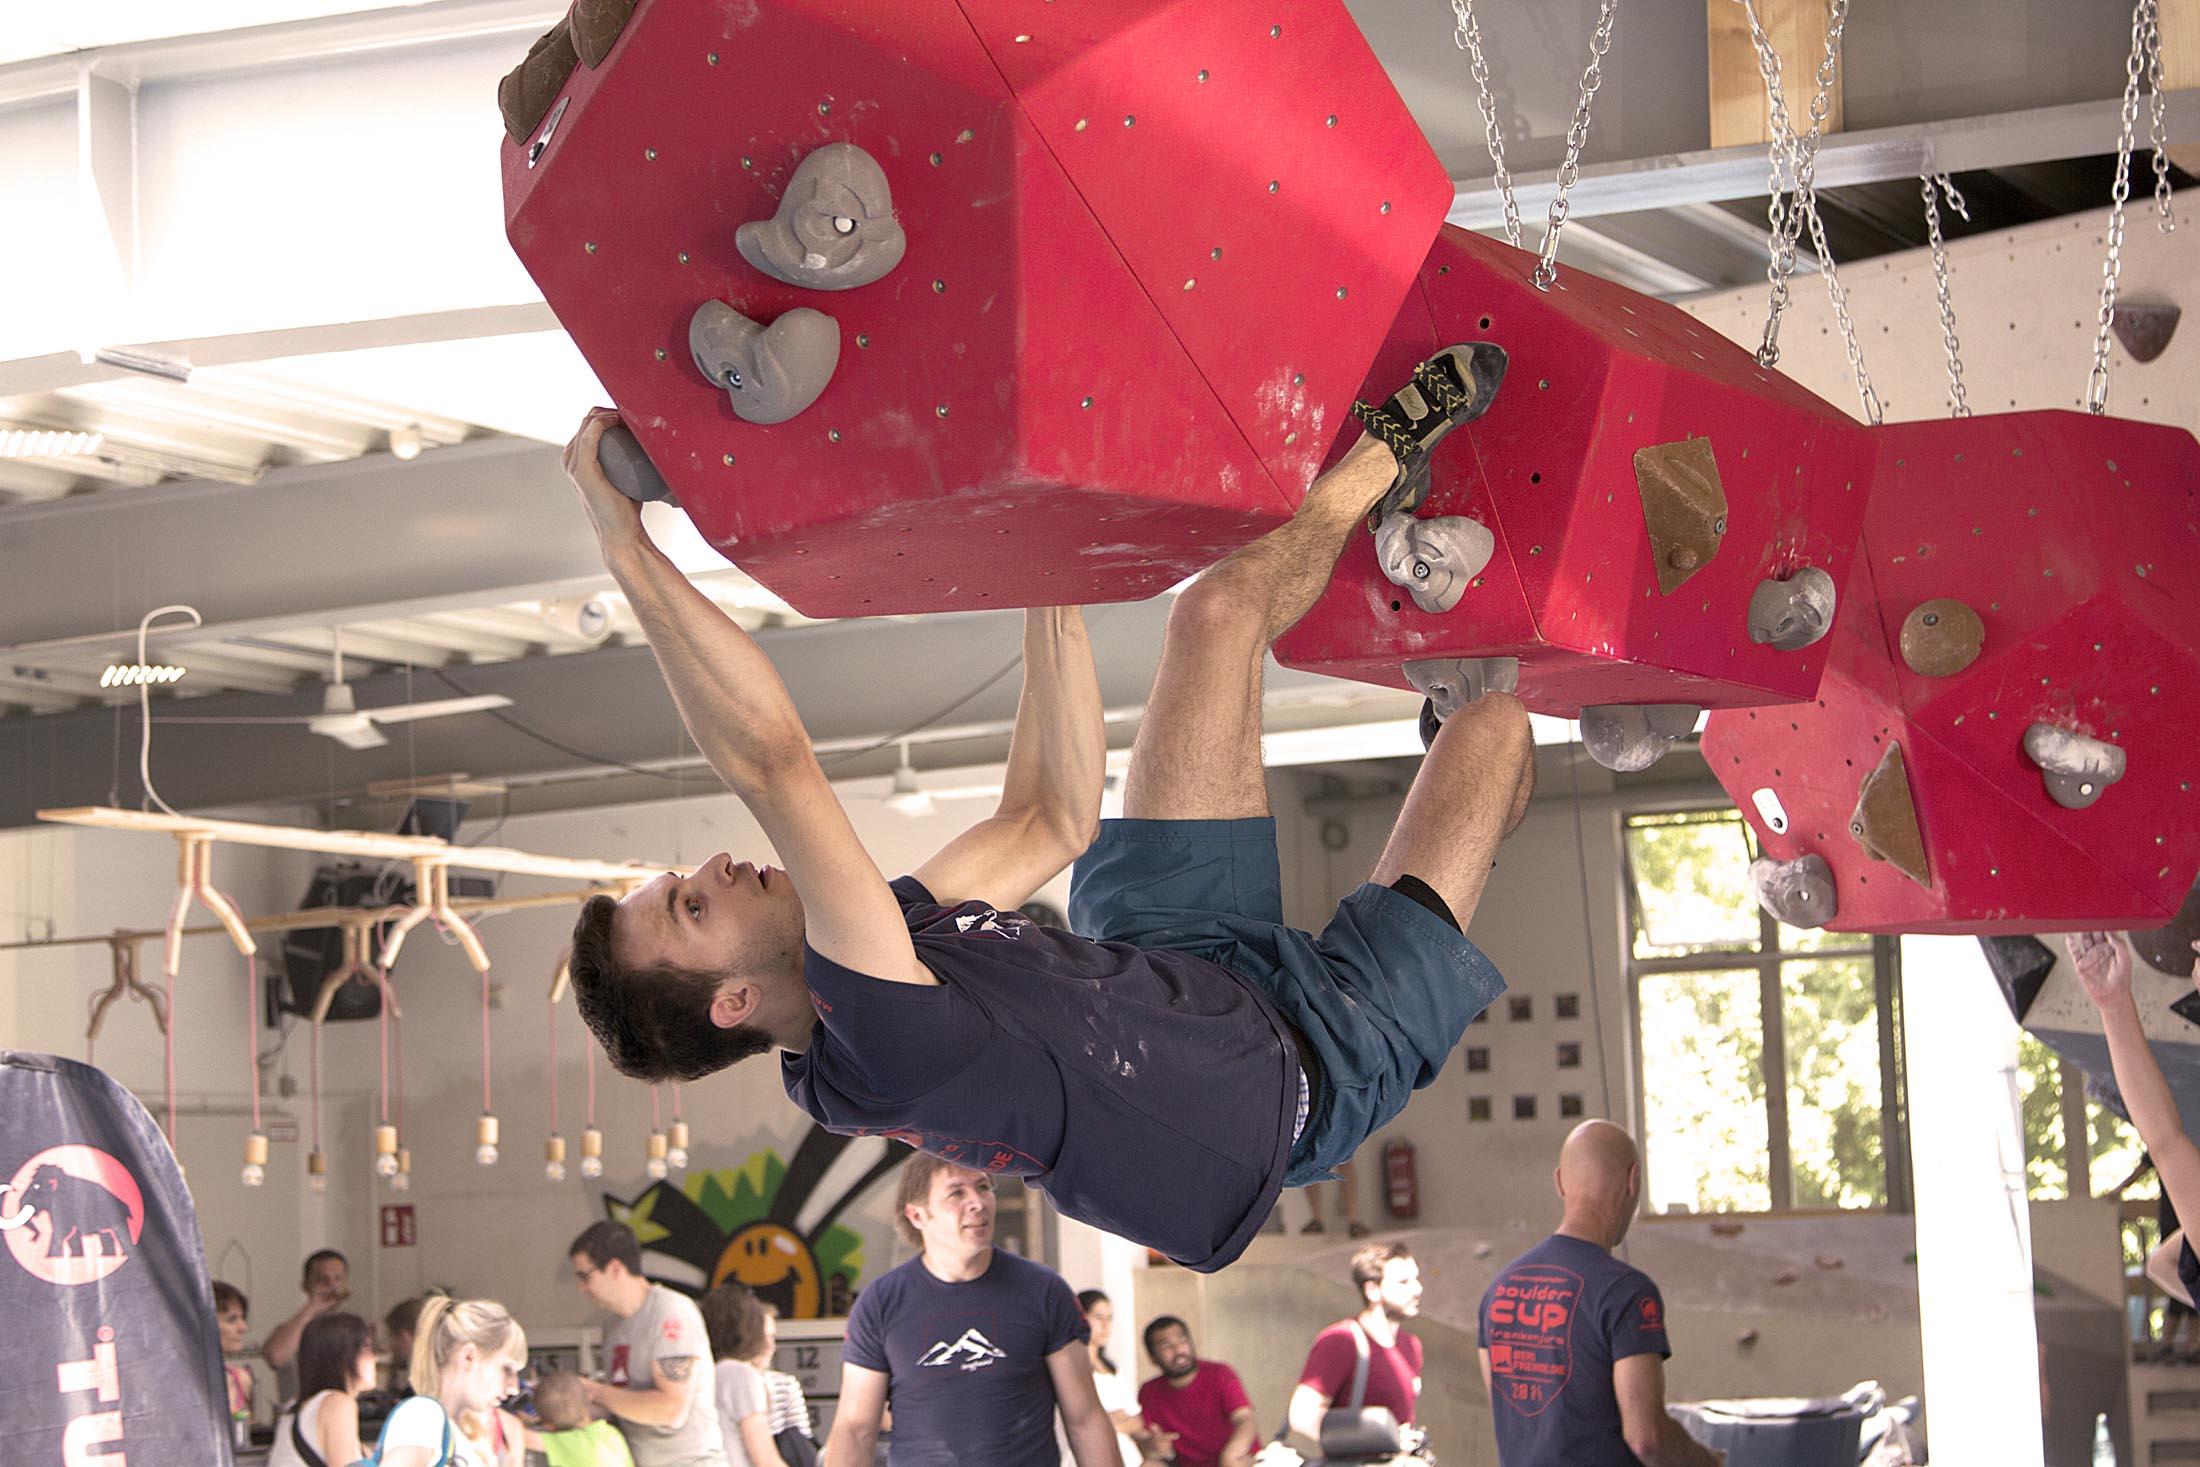 Quali, internationaler bouldercup Frankenjura 2016, BLOCKHELDEN Erlangen, Mammut, Bergfreunde.de, Boulderwettkampf07092016122